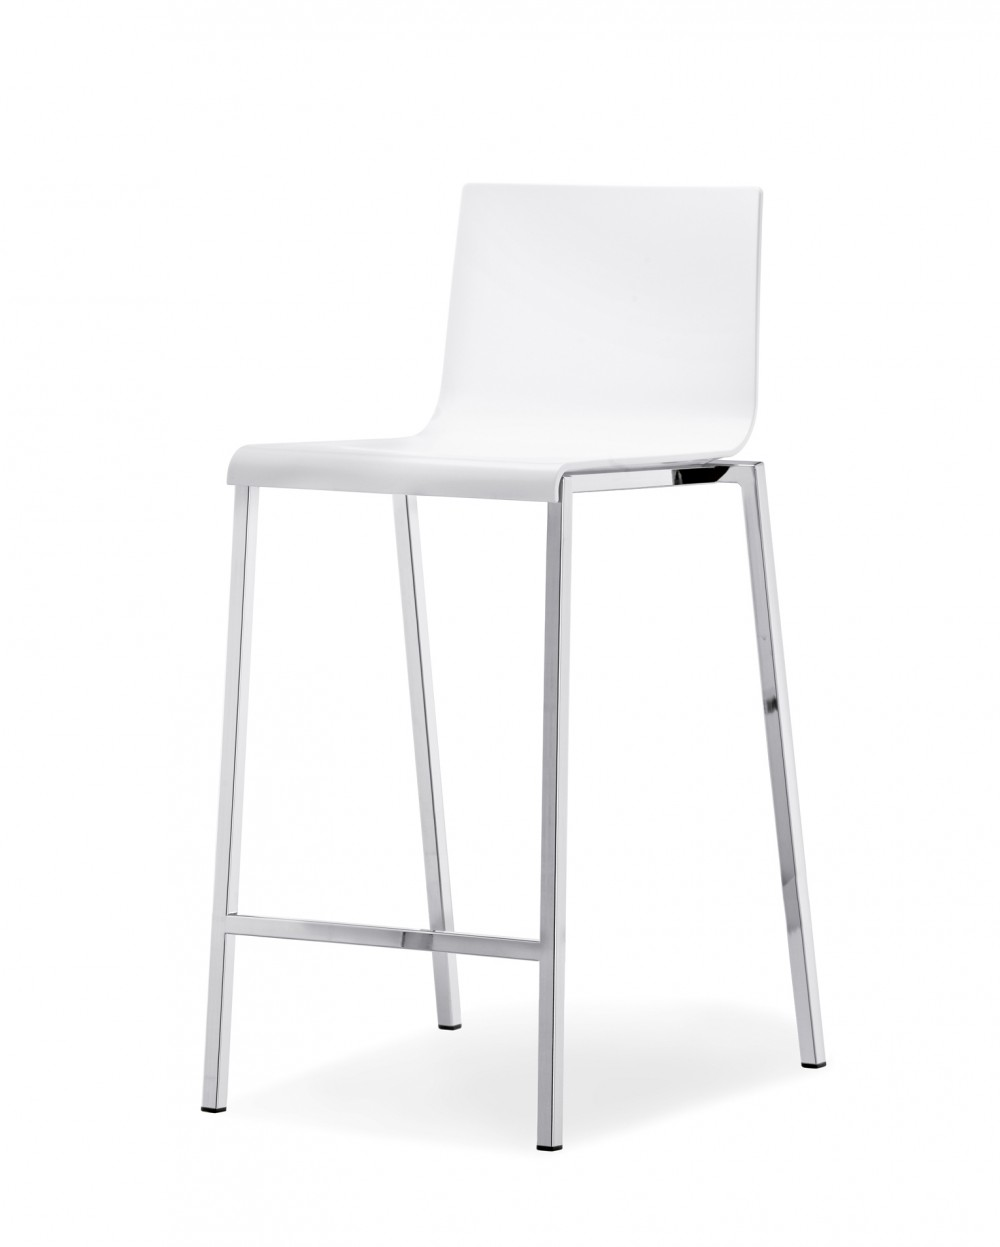 design barstuhl wei barhocker wei chrome sitzh he 80 cm. Black Bedroom Furniture Sets. Home Design Ideas